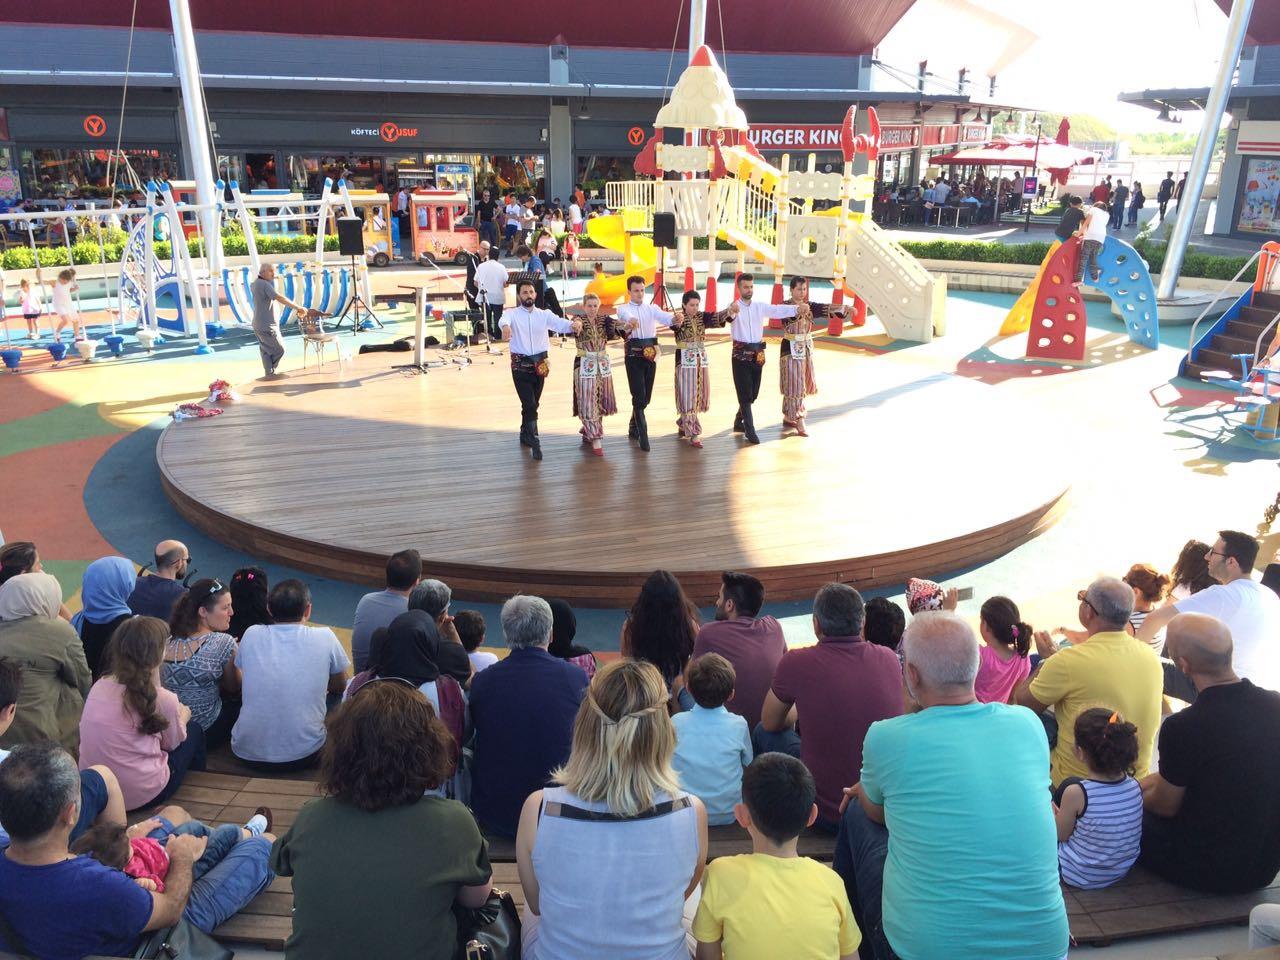 Outlet Center İzmit'te 30 Ağustos Zafer Bayramı coşkusu